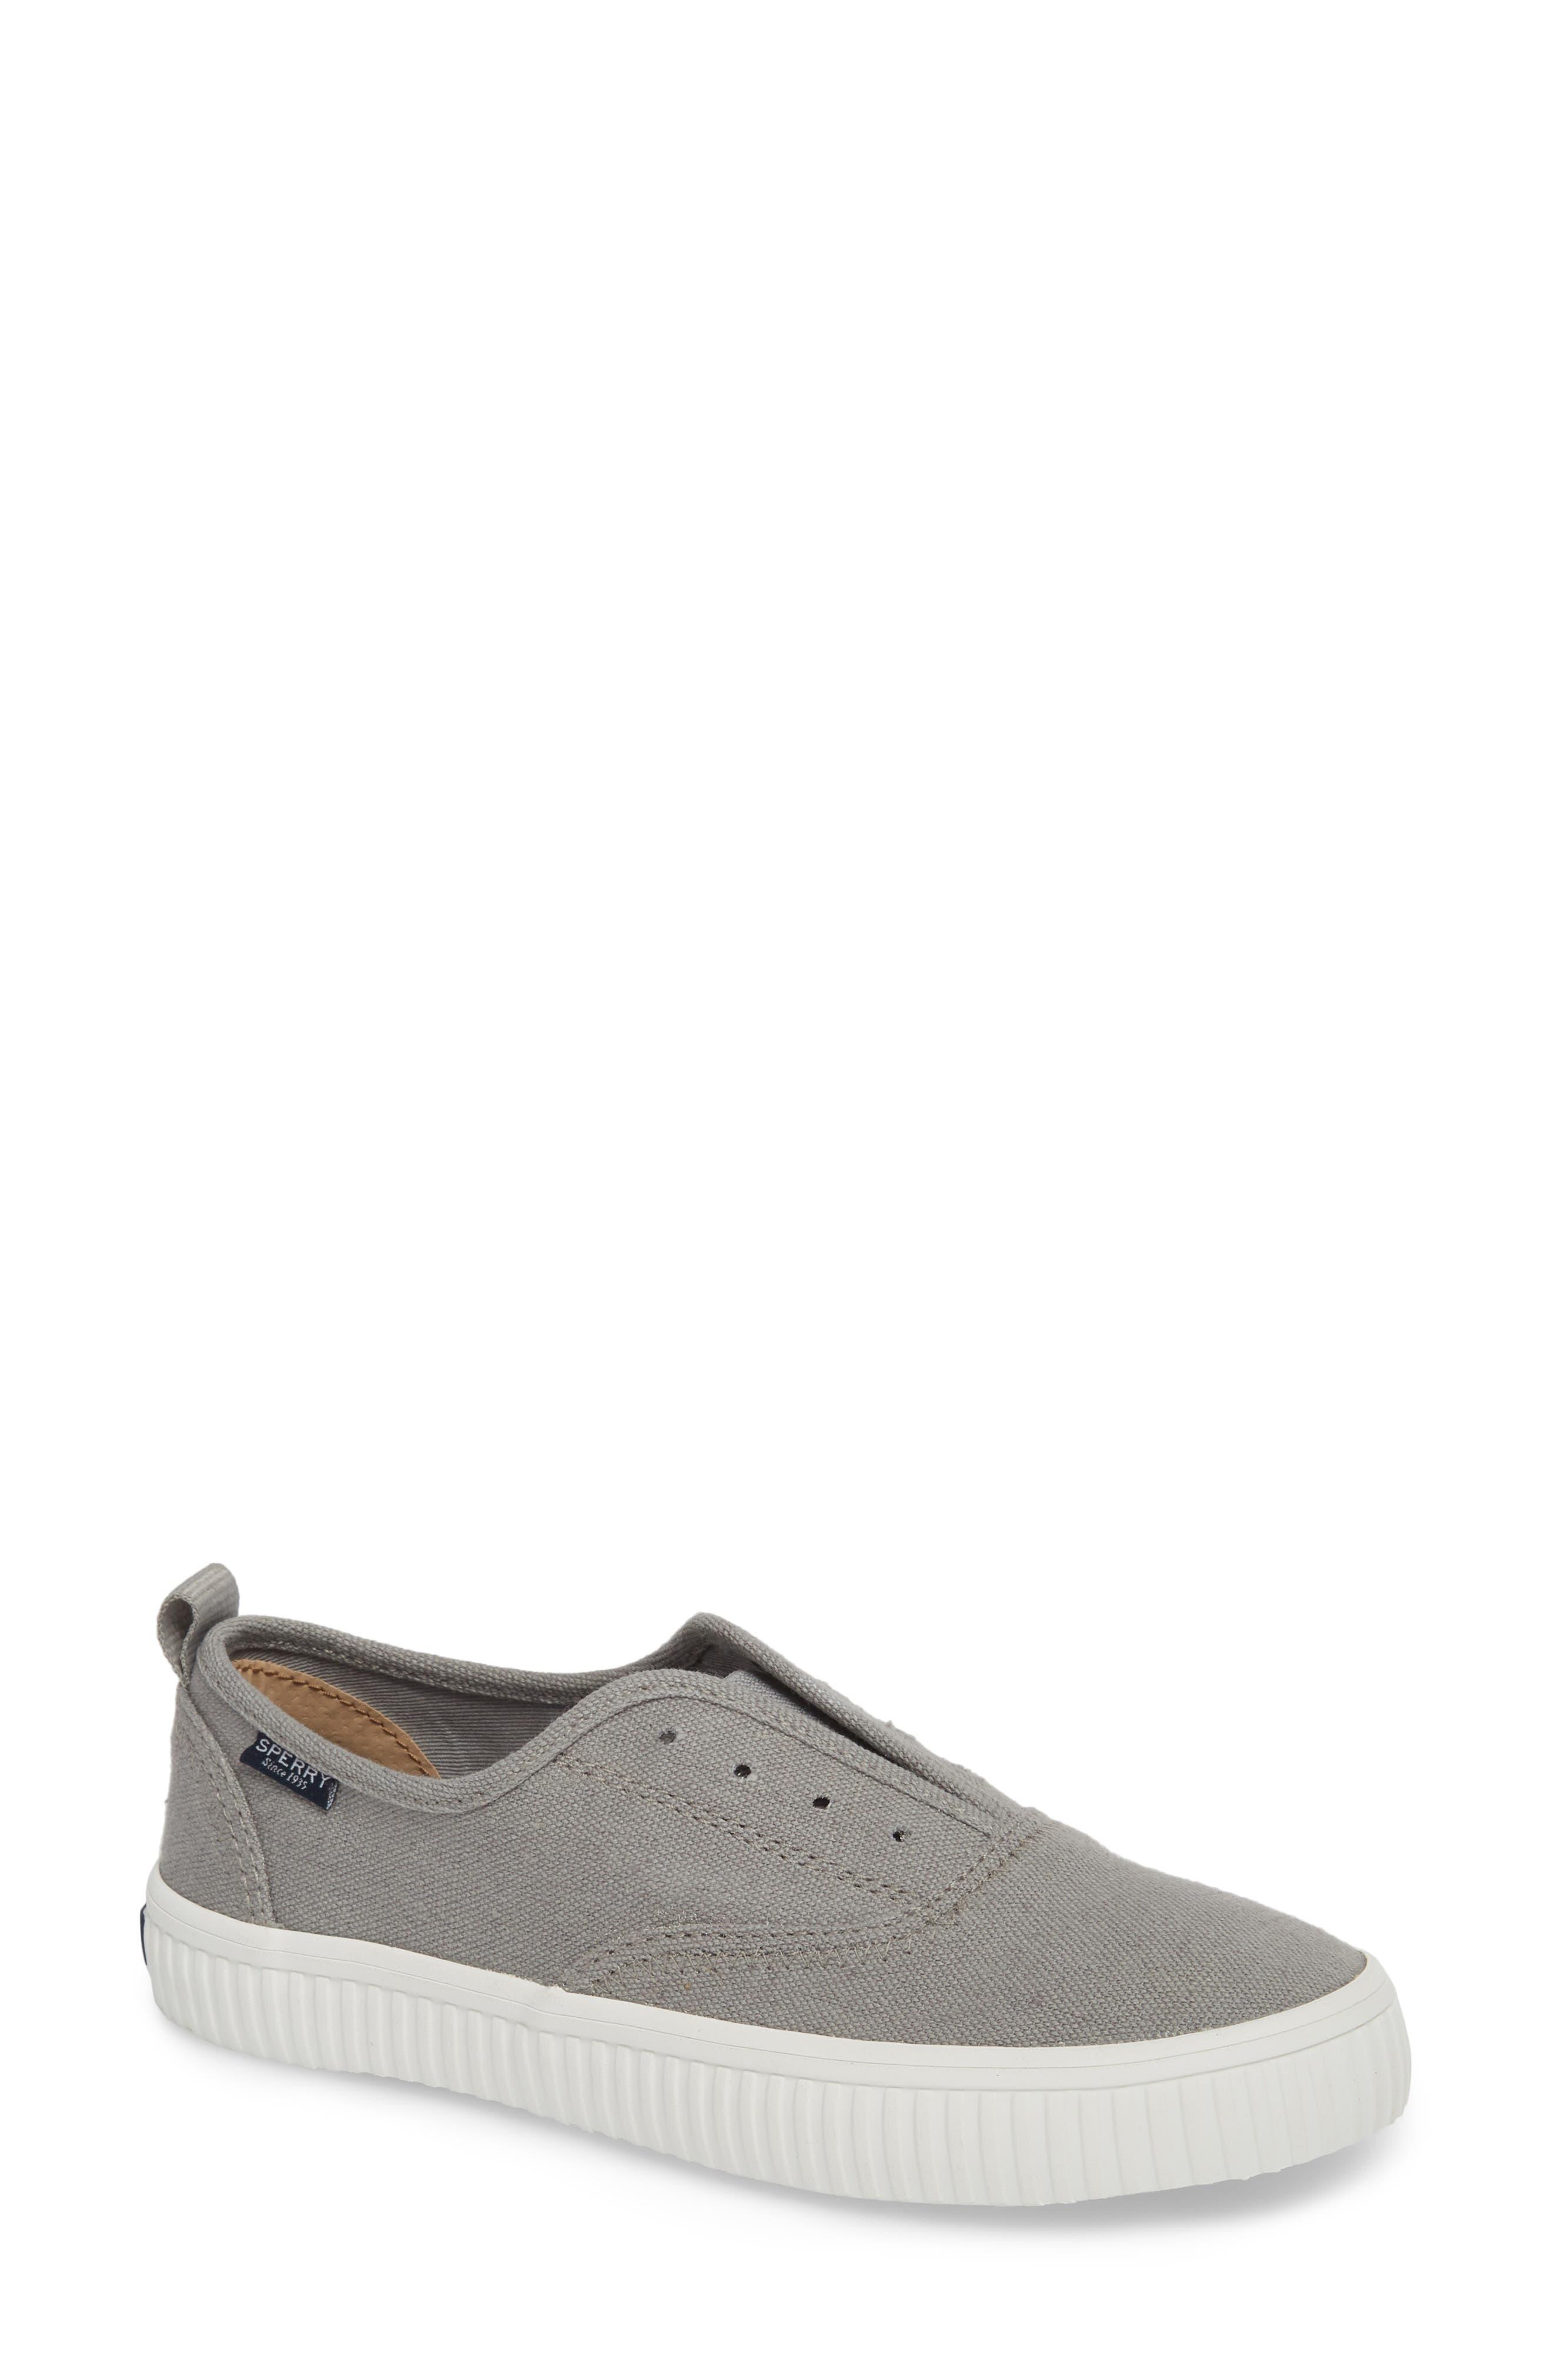 Crest Creeper CVO Slip-On Sneaker,                         Main,                         color, Grey Fabric